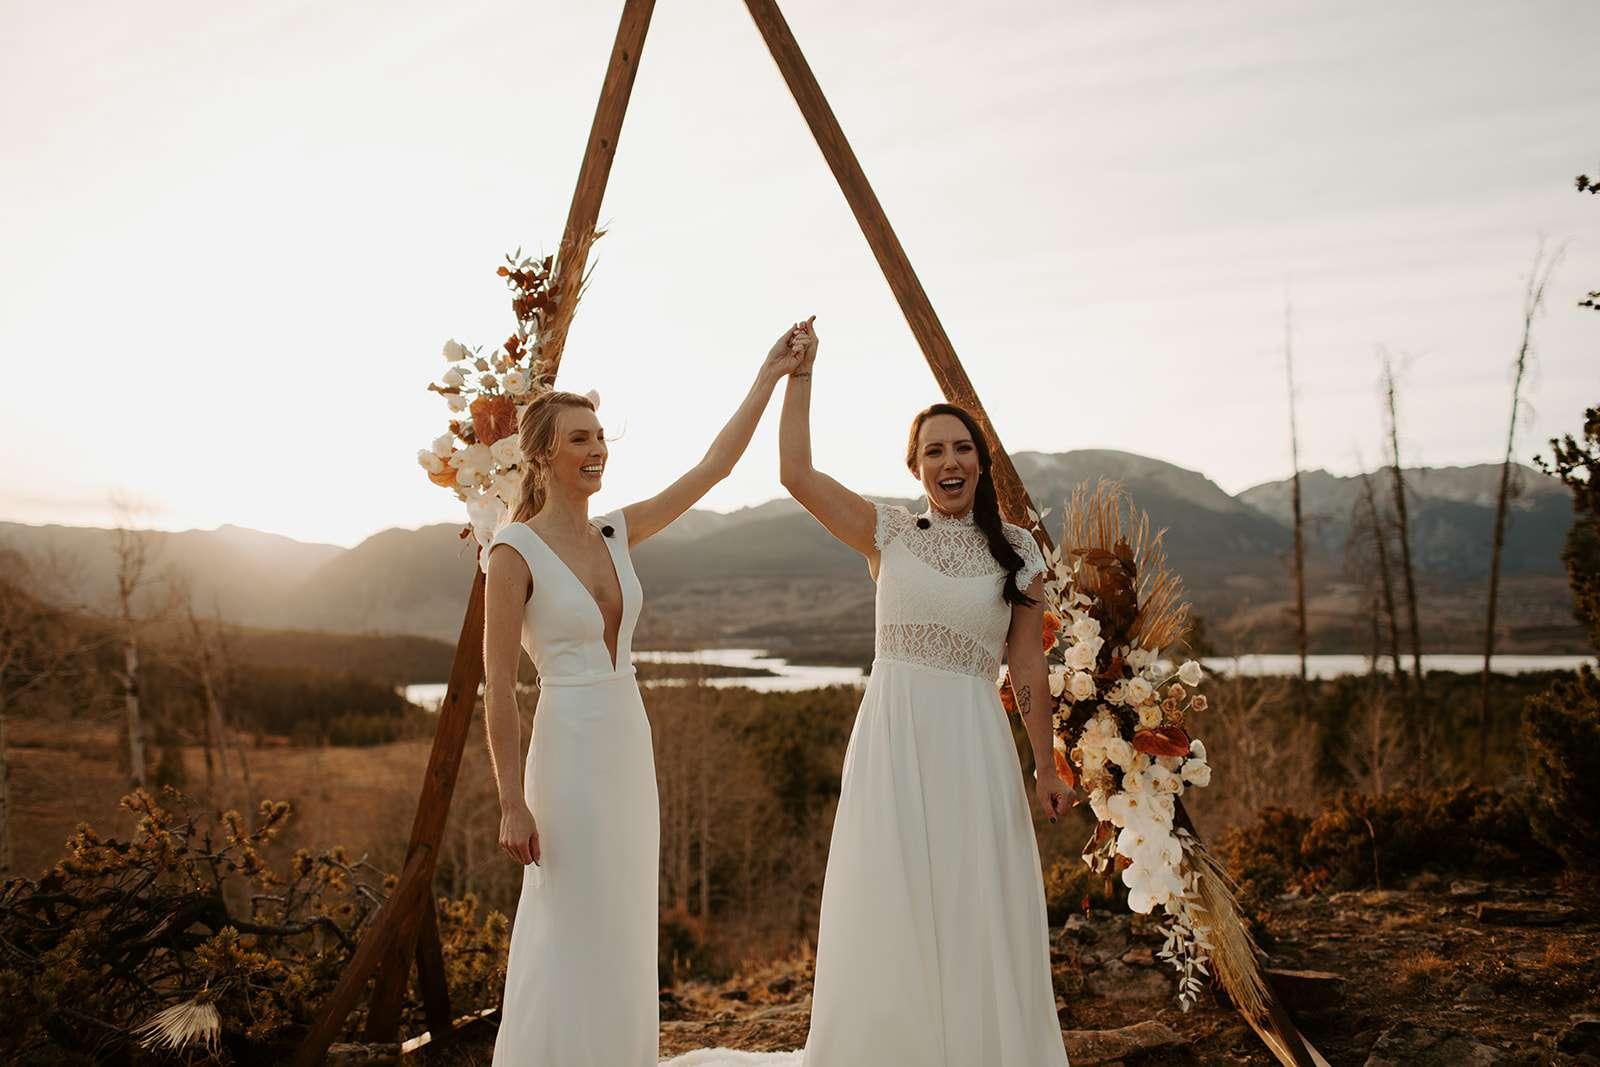 Brides celebrate at altar